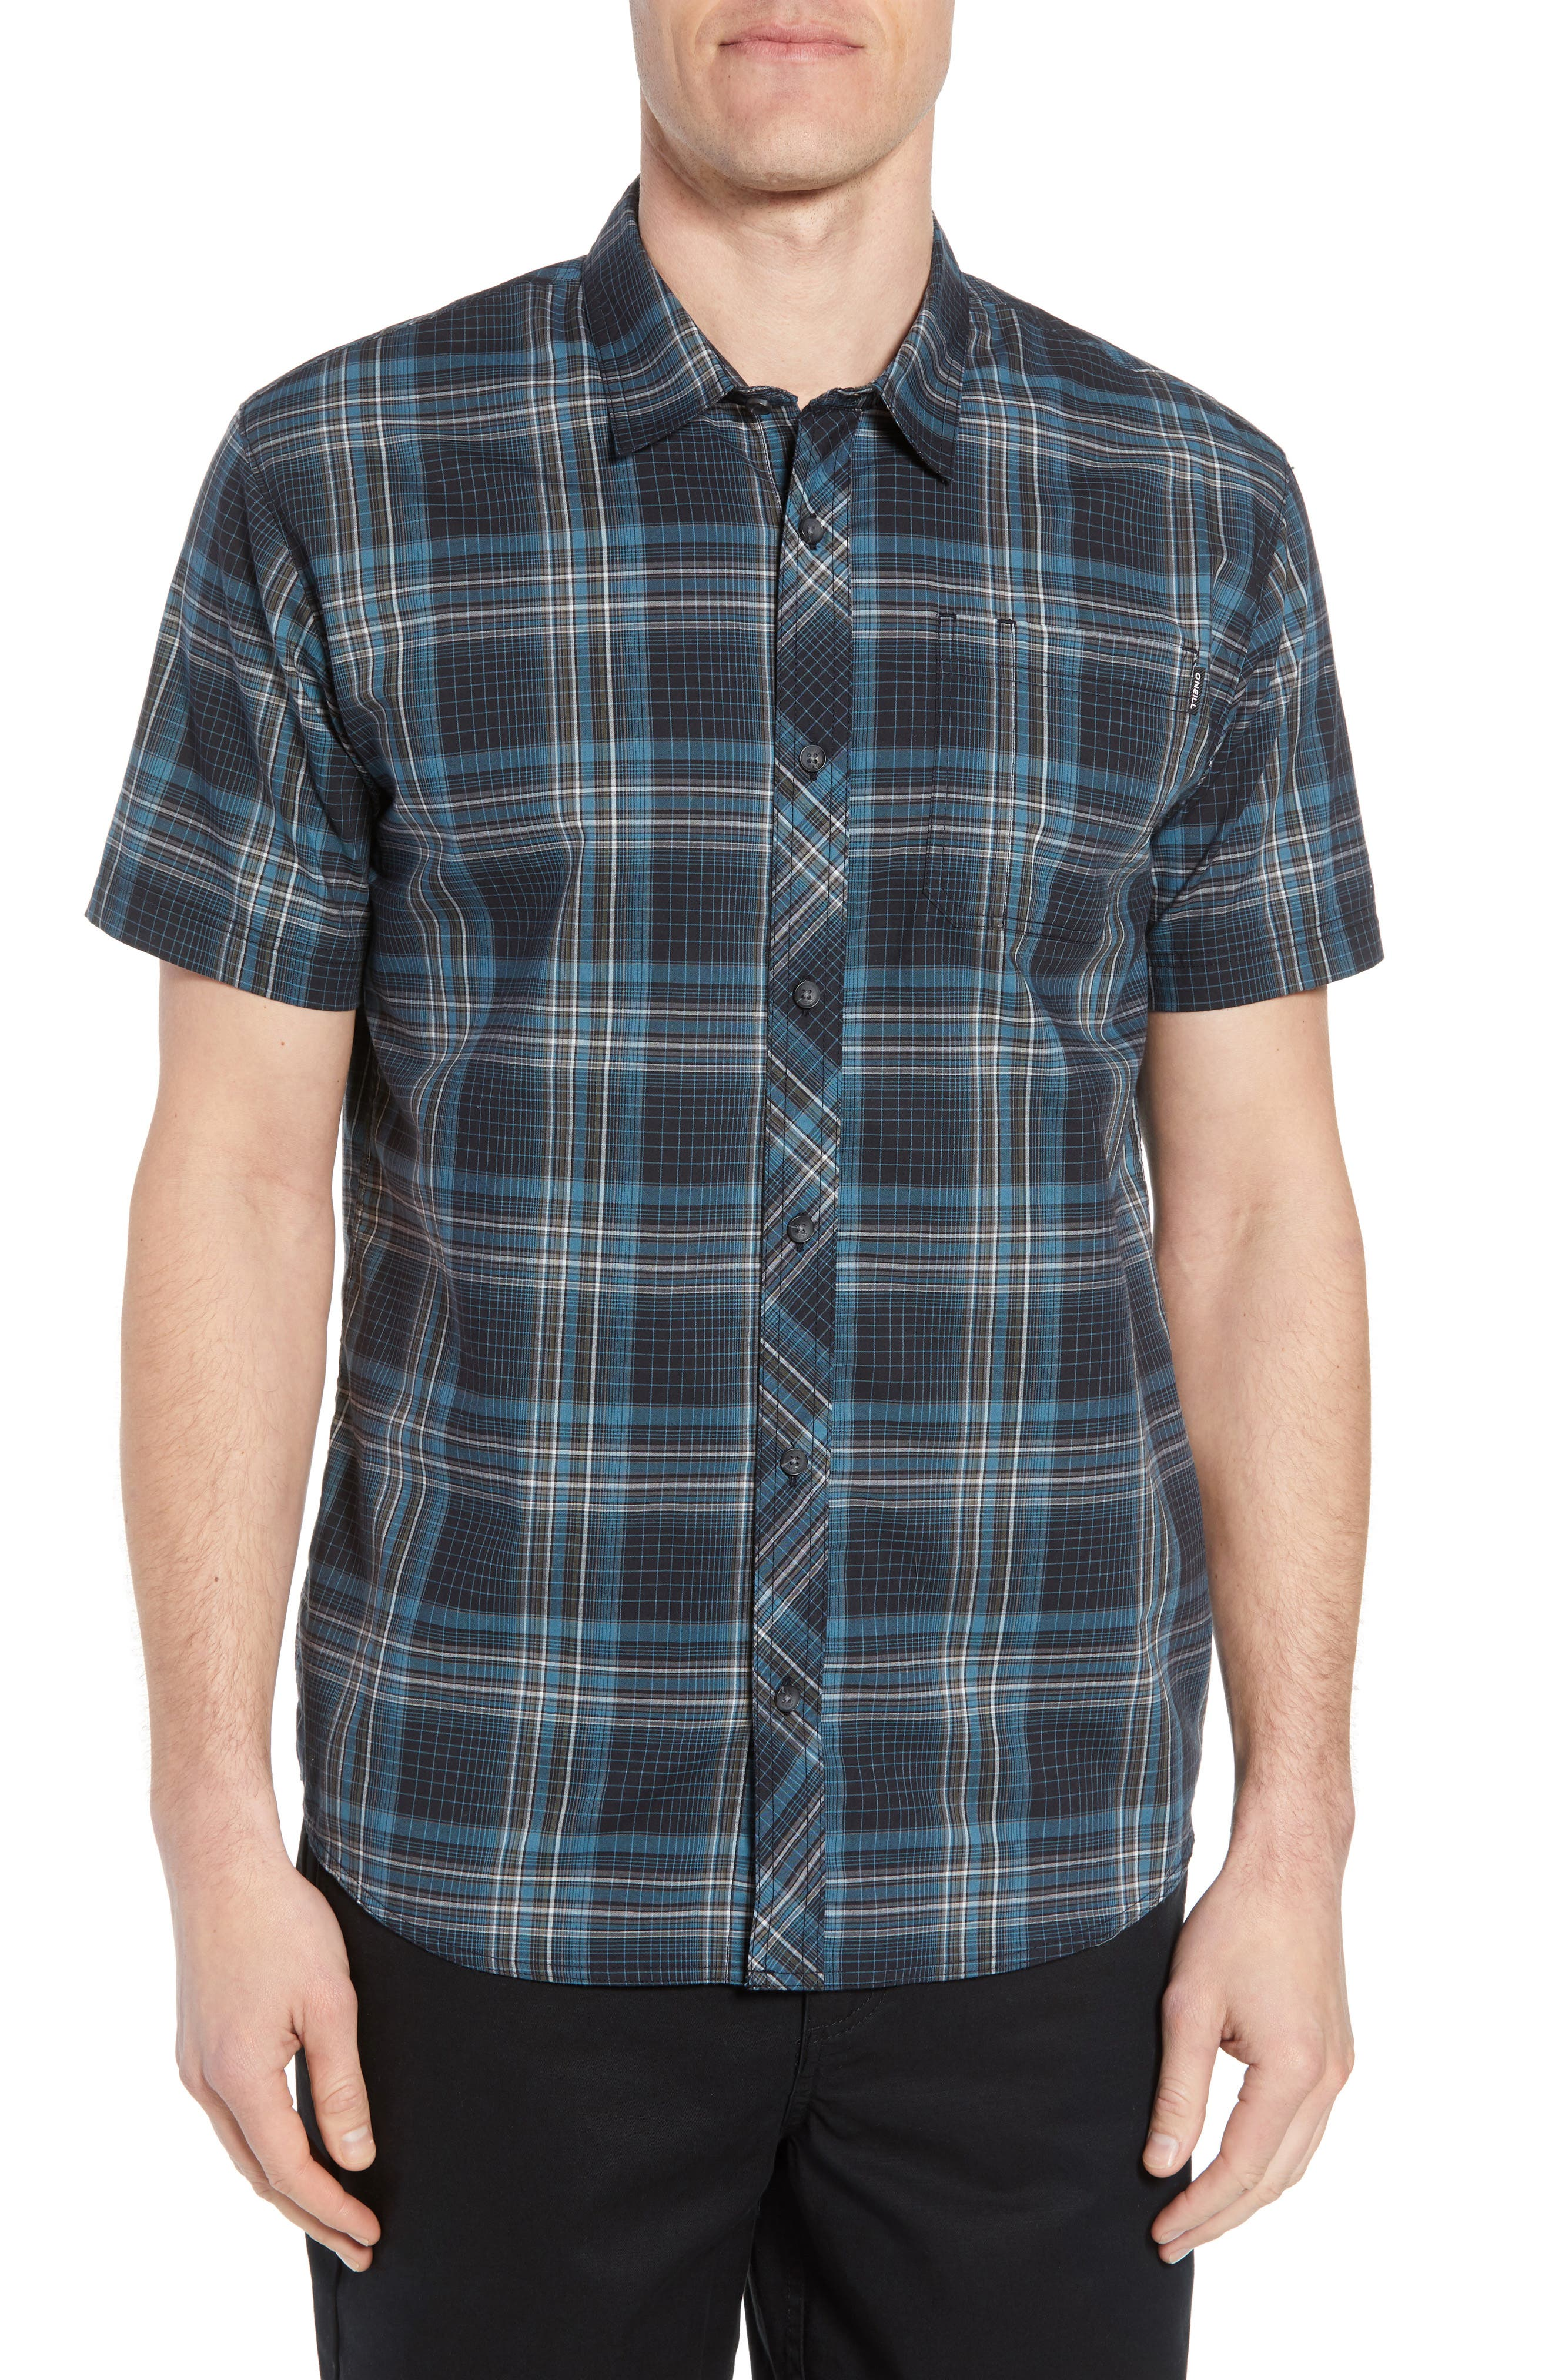 Alternate Image 1 Selected - O'Neill Sturghill Woven Shirt